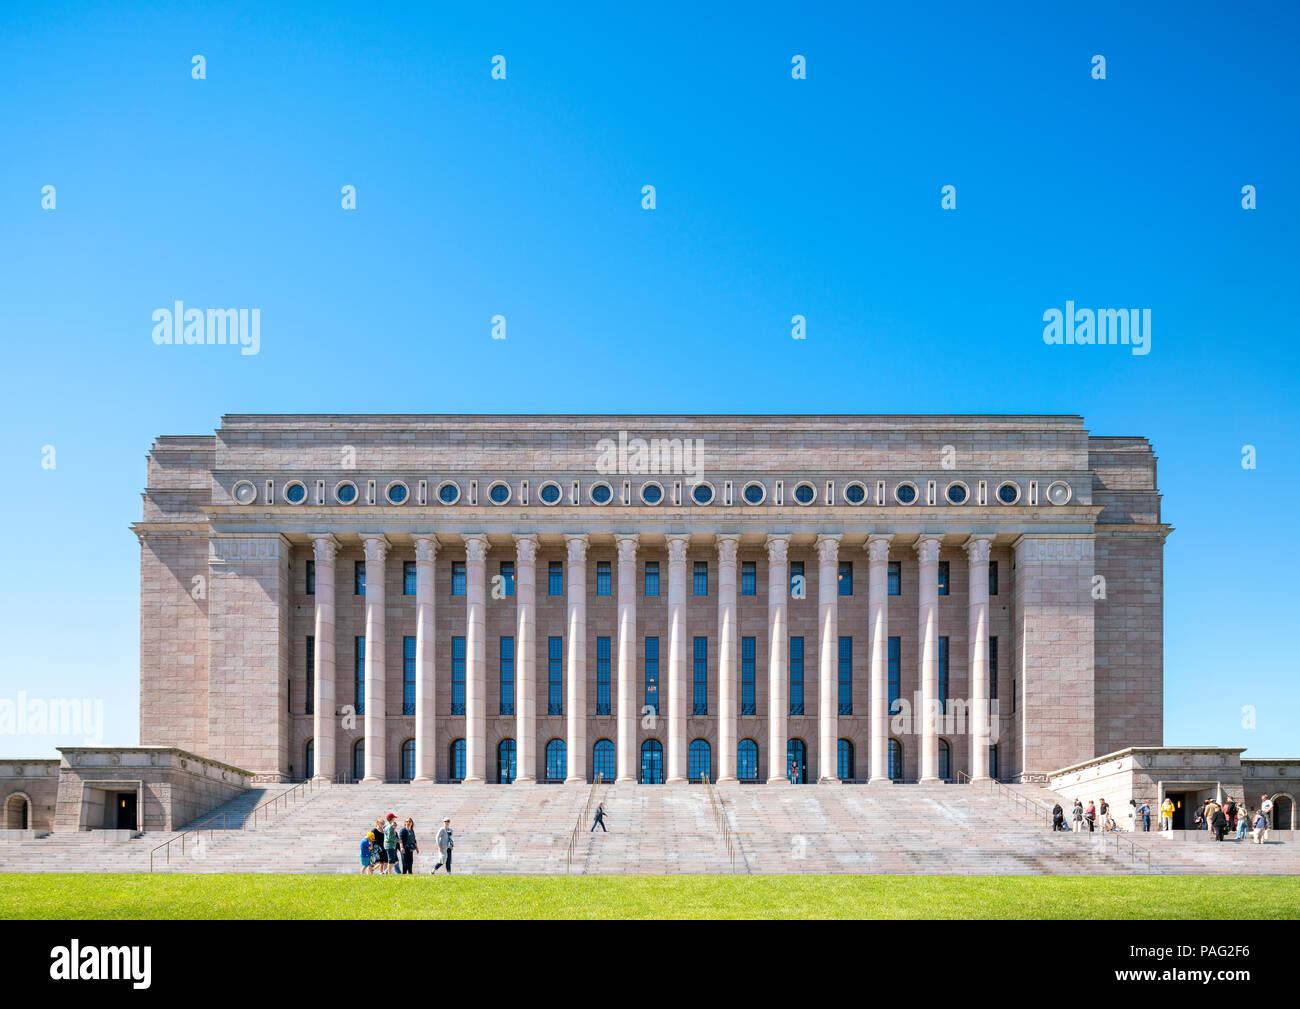 Helsinki Parliament House, Suomen Eduskunta, Eduskuntatalo, Finlands Riksdag, Riksdagshuset, Finnish National Parliament Building - Stock Image